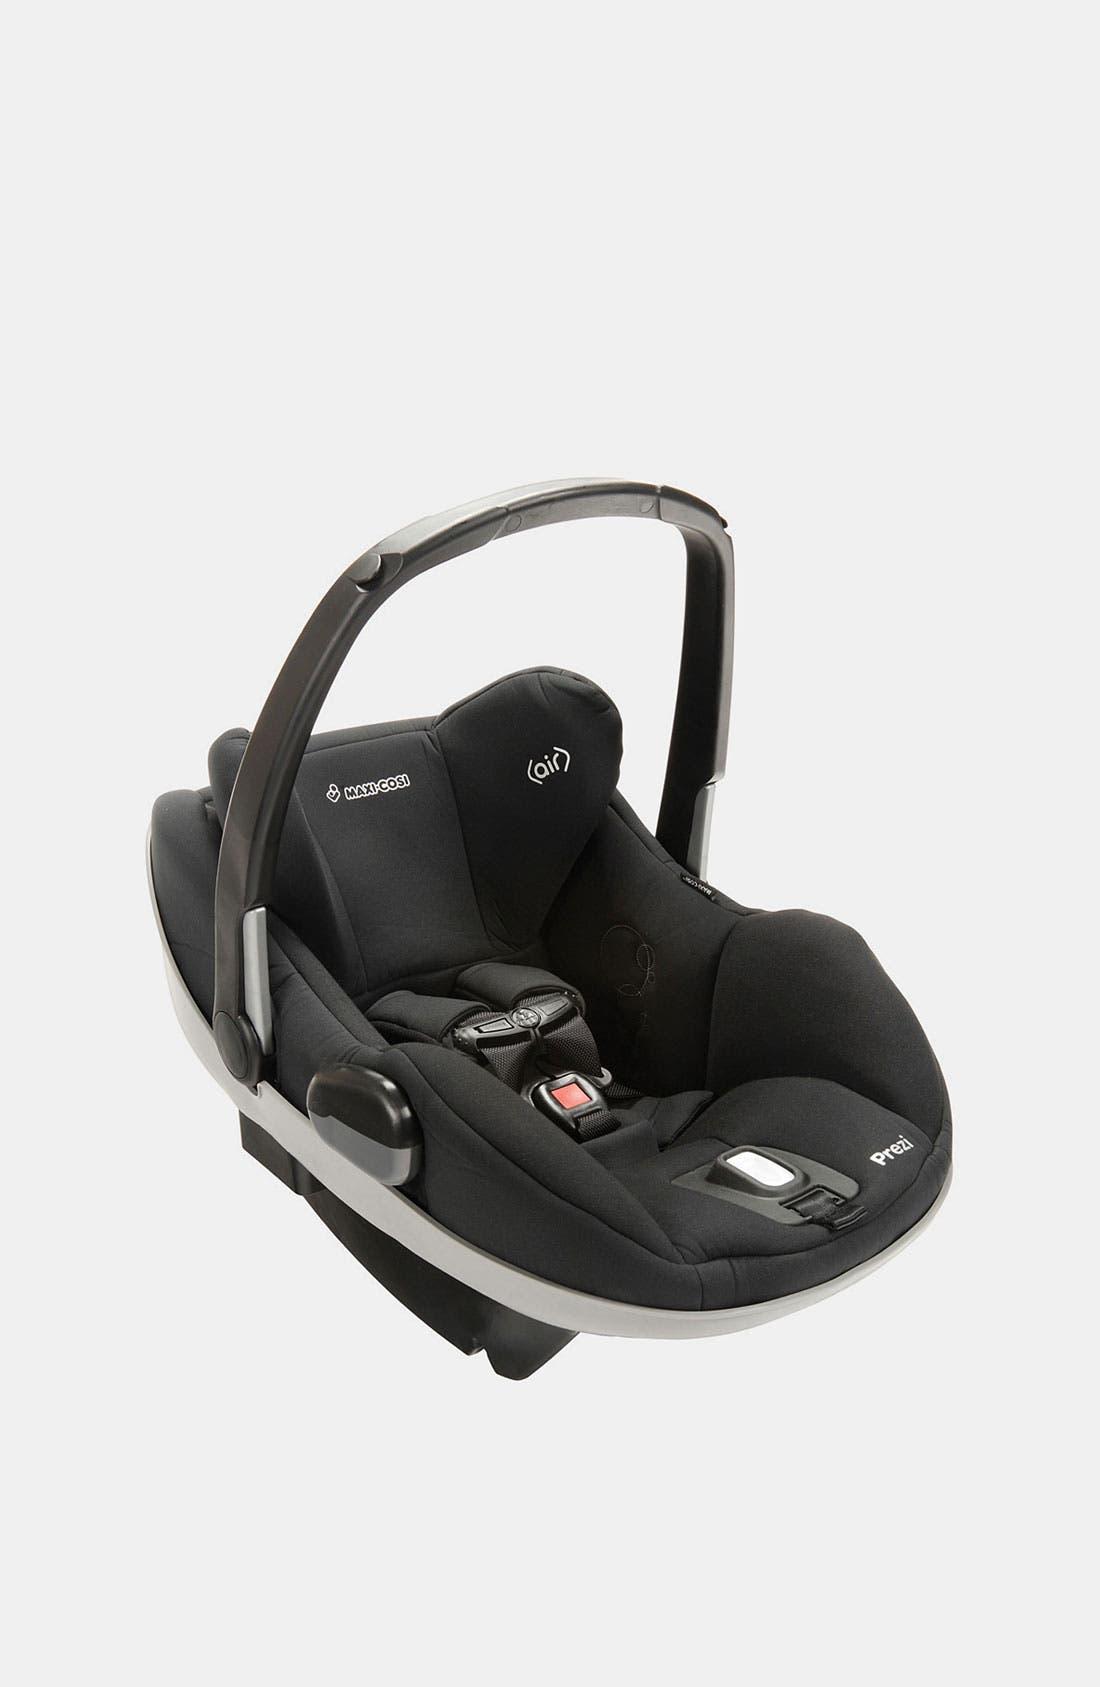 Alternate Image 1 Selected - Maxi-Cosi® 'Prezi' Infant Car Seat